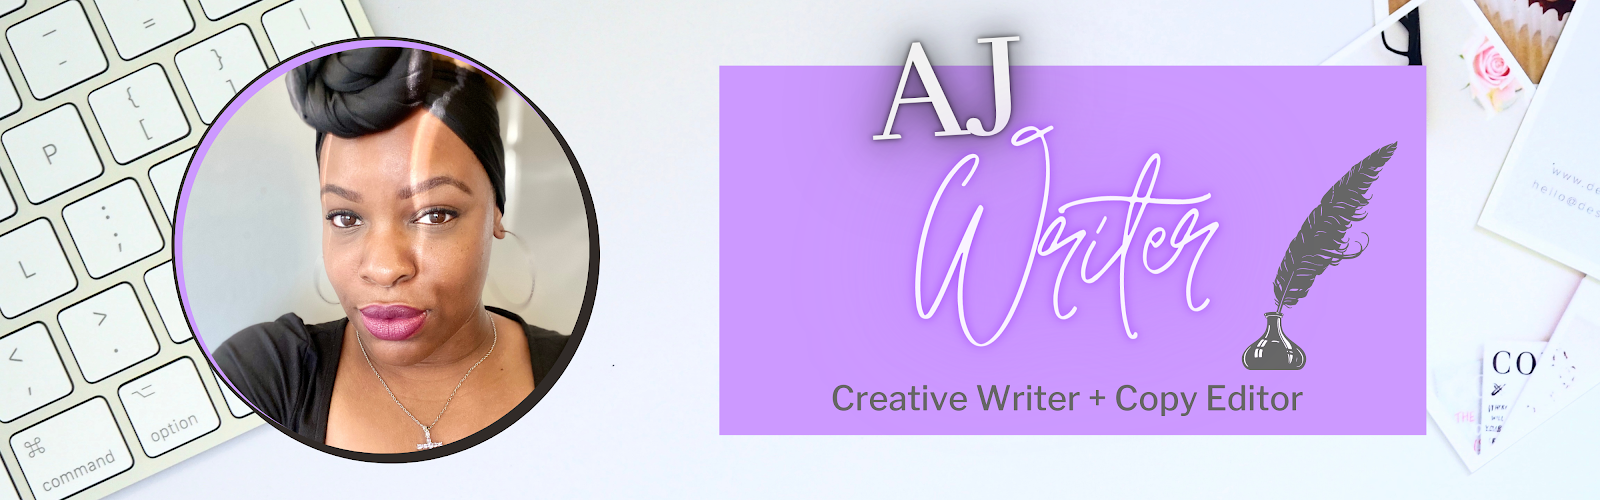 AJ Writer